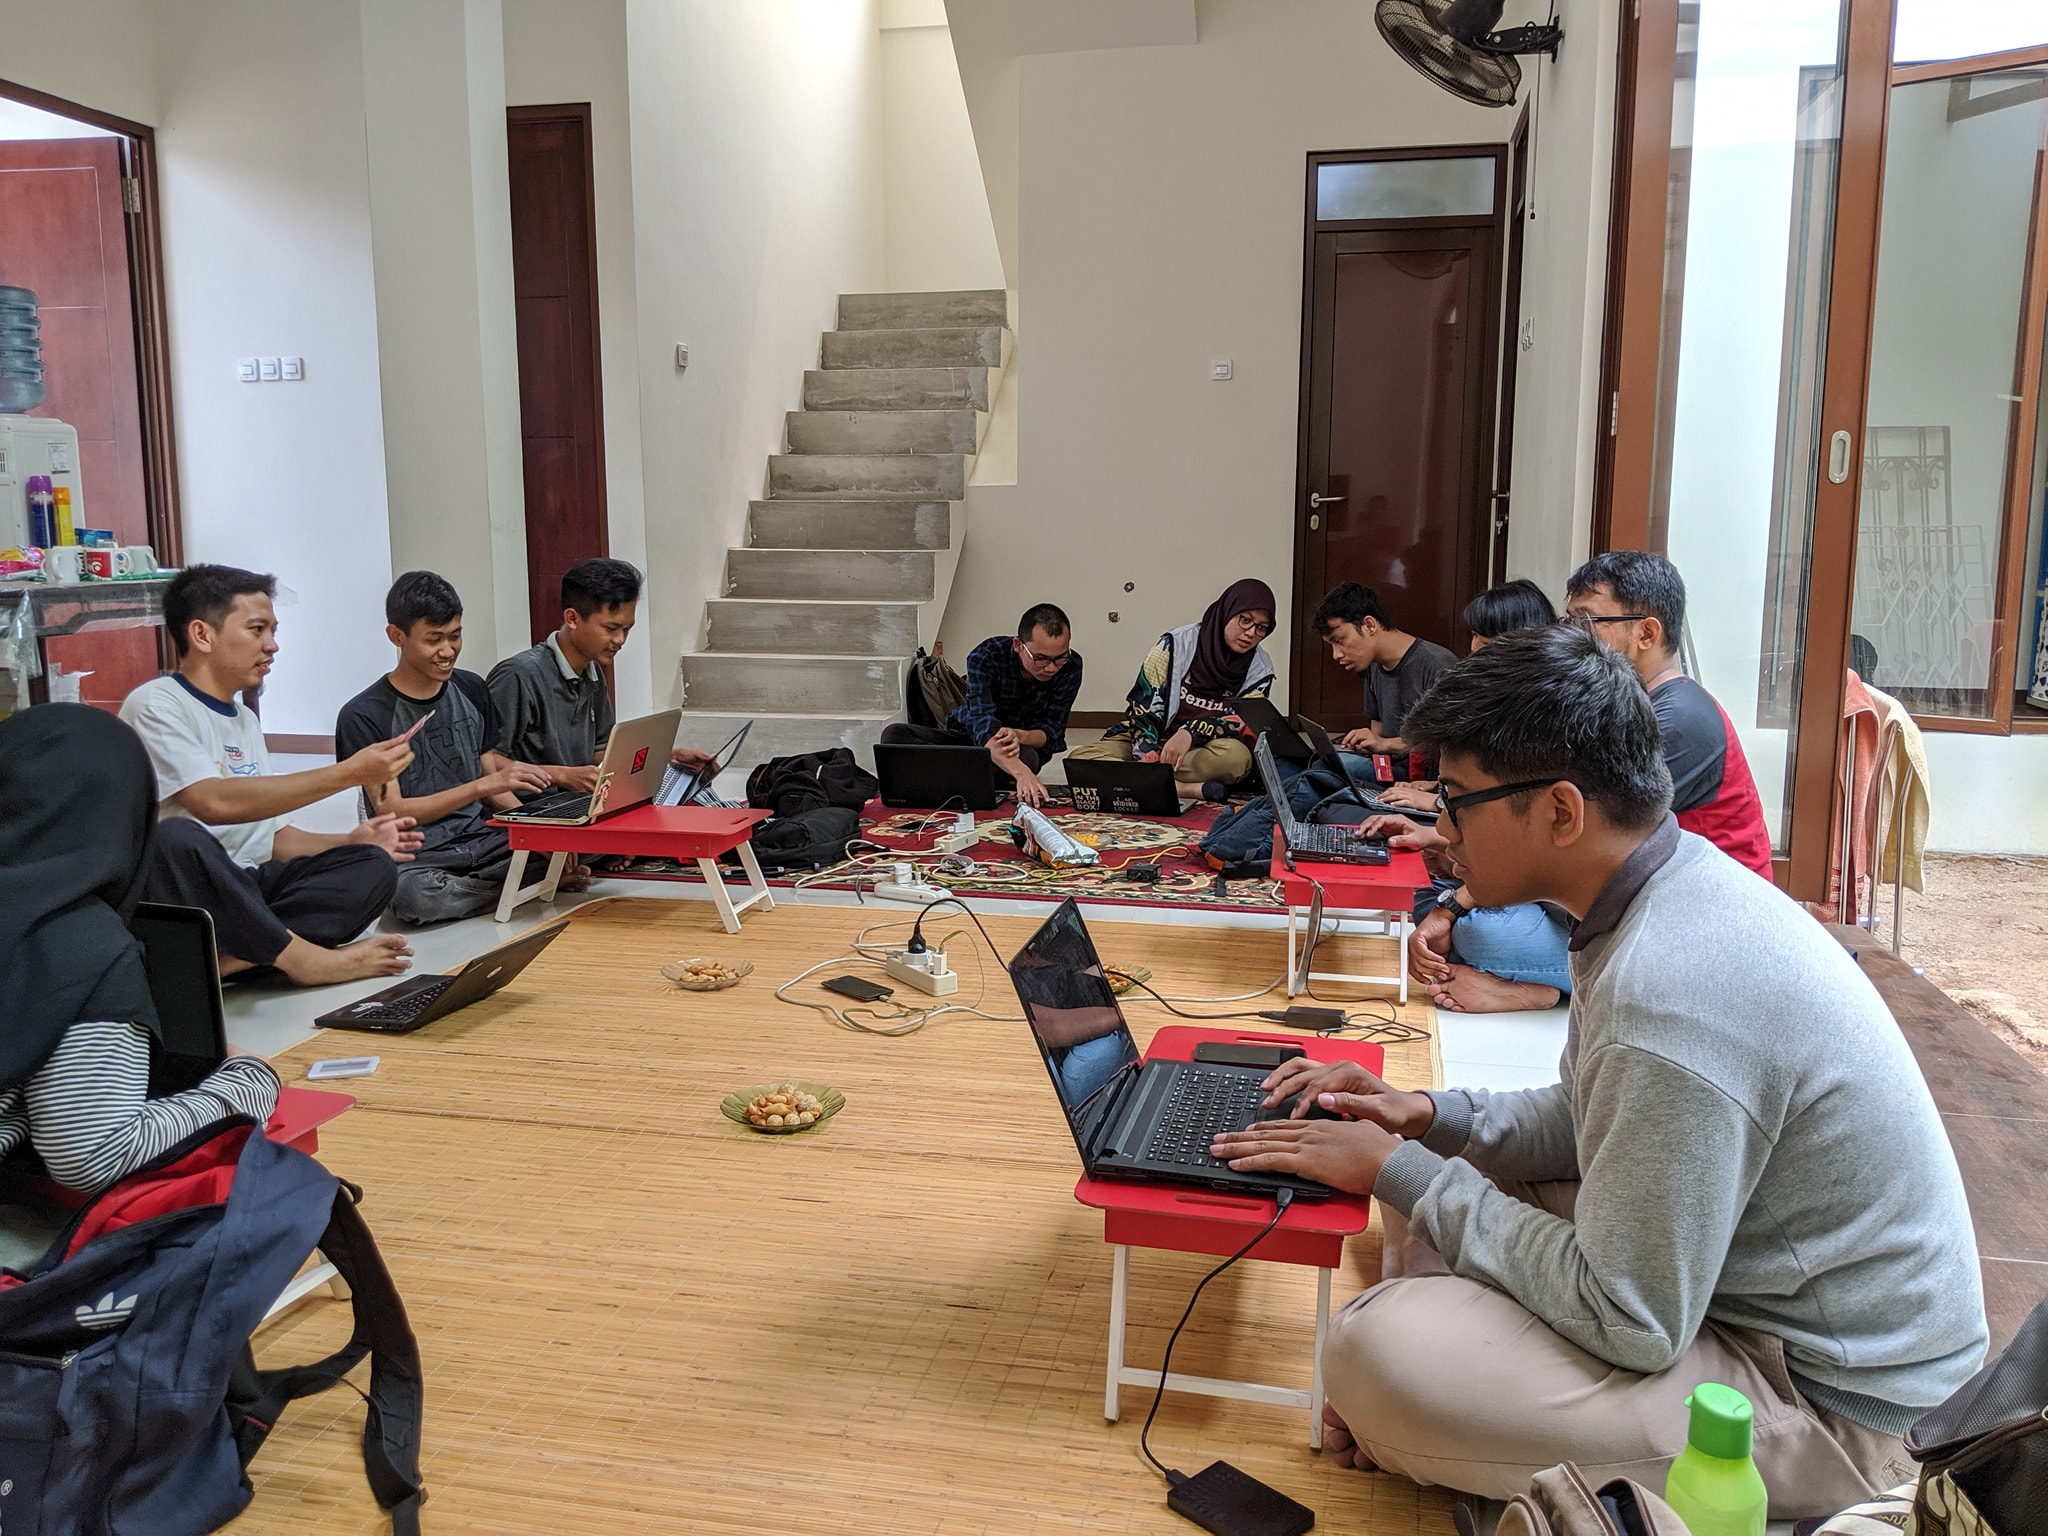 Arief dan Komunitas Open Source | Yayasan Komunitas Open Source/Shutterstock